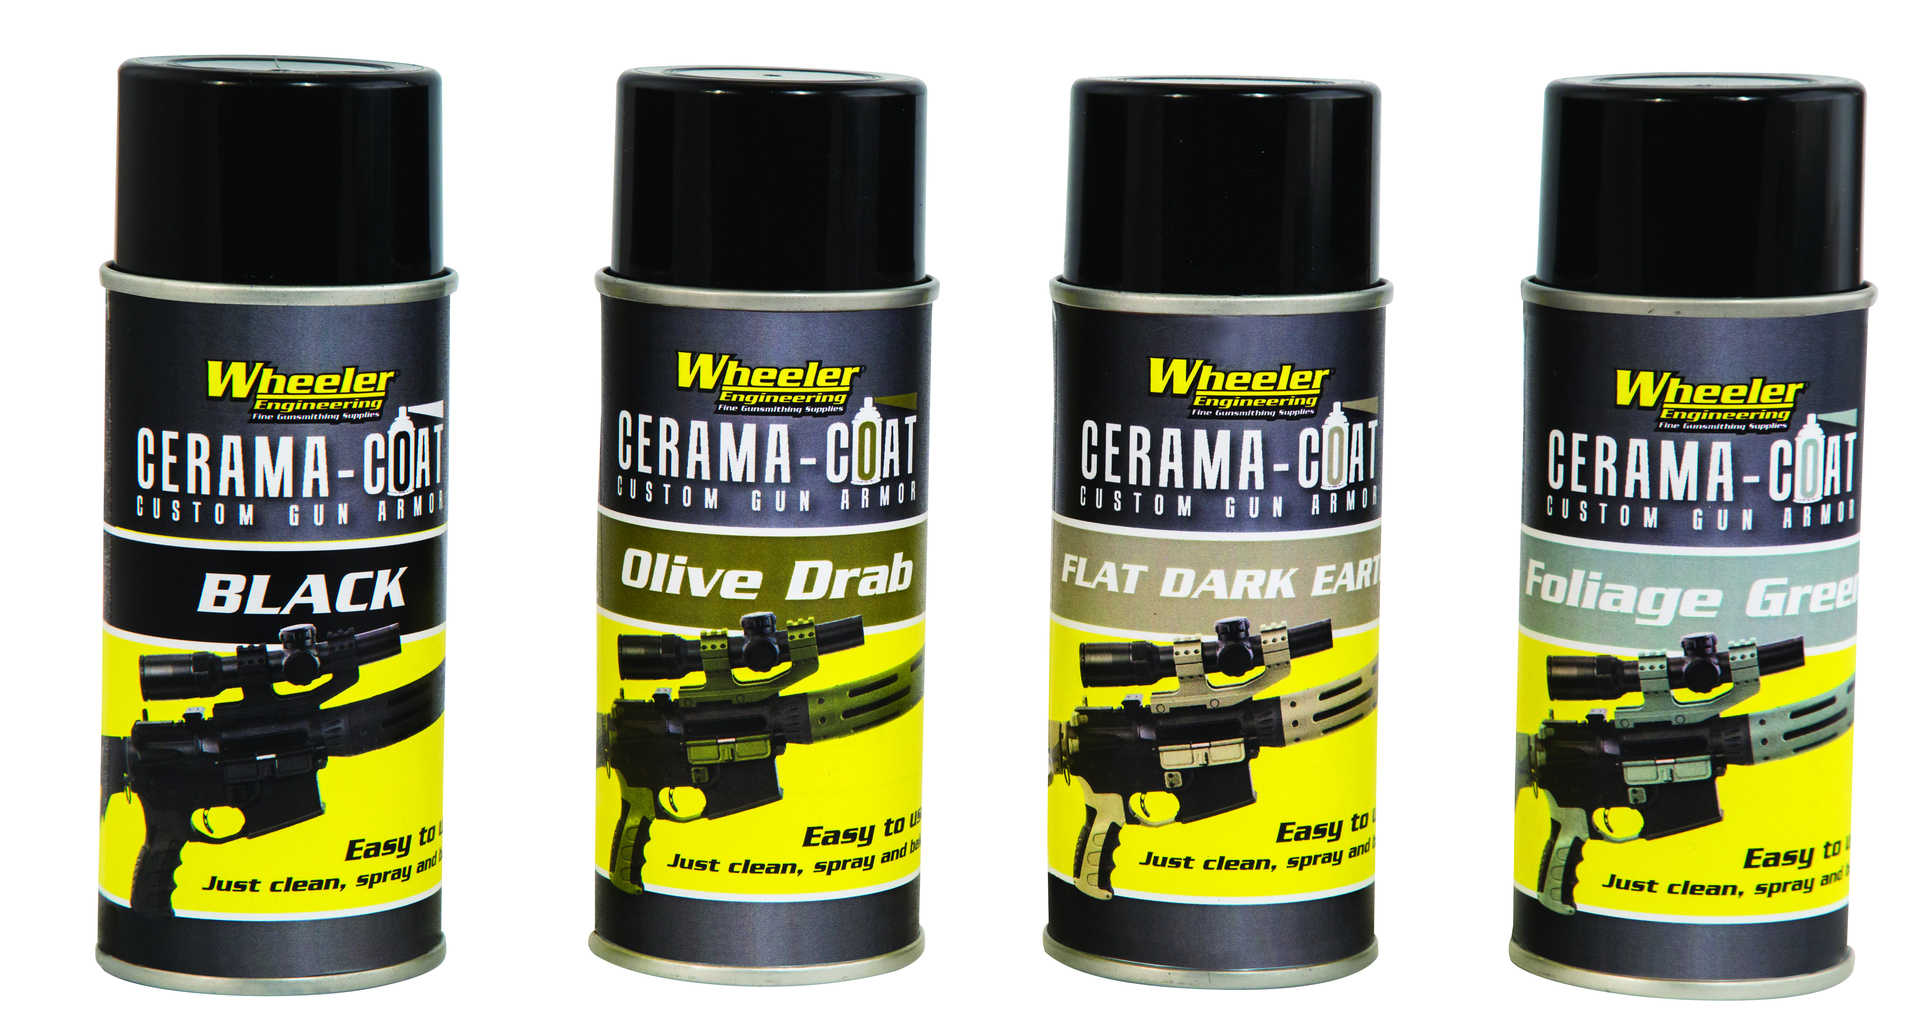 Cerama Coat™, Foliage Green - Wheeler Cerama Coat All Cans